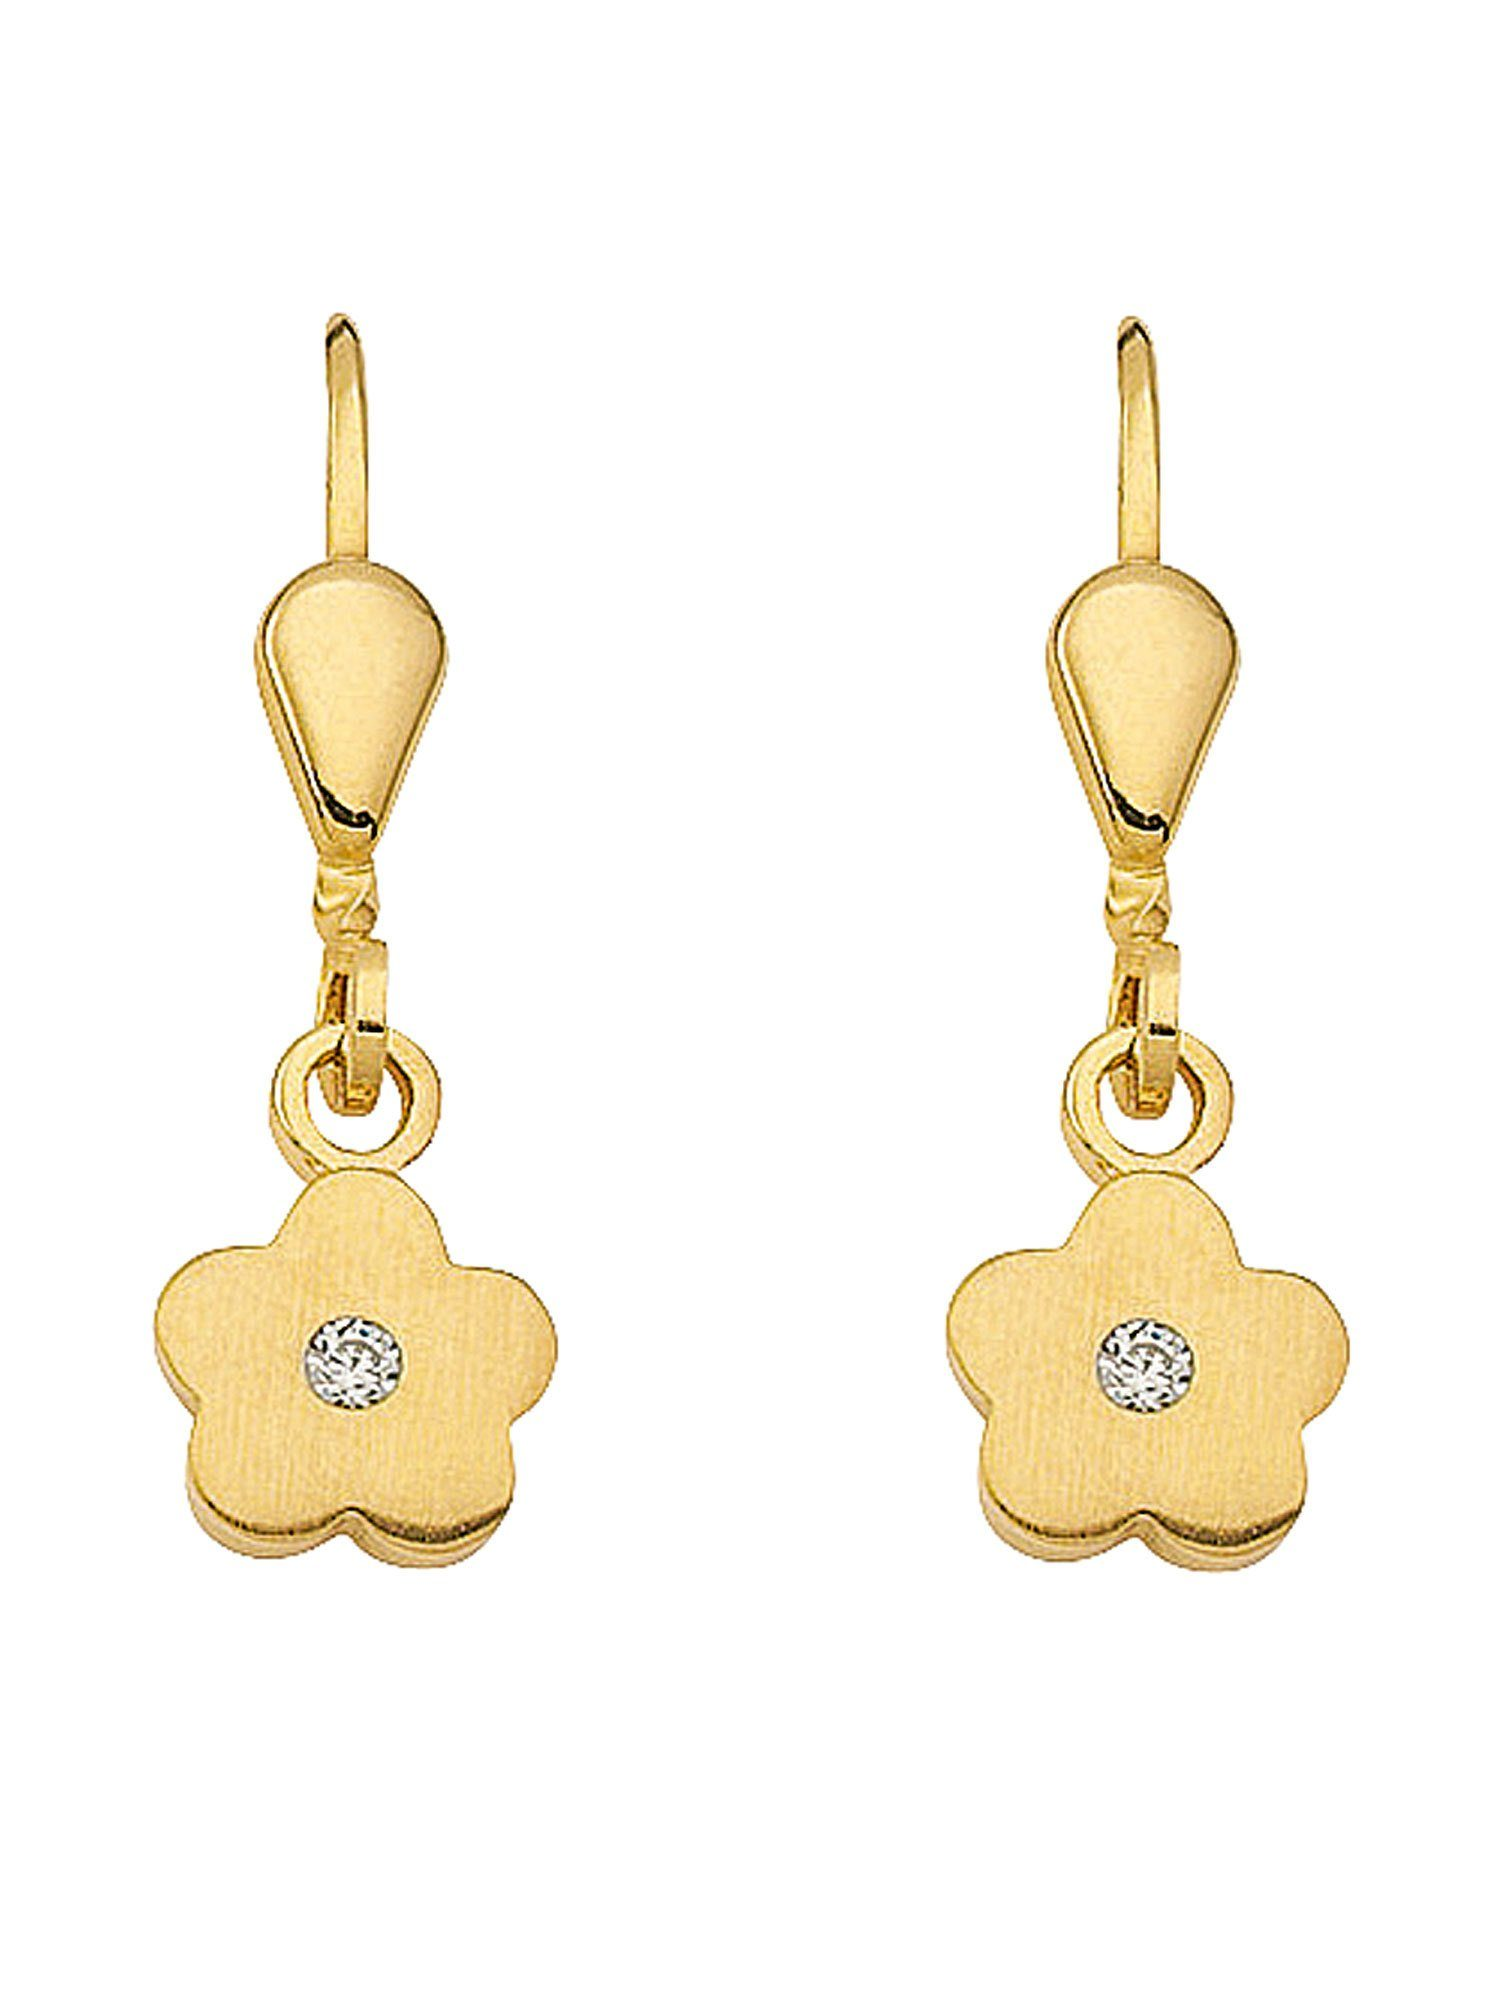 Adelia´s Paar Ohrhänger »Gold 8 k (333) Ohrringe - Ohrhänger« Blüte 8 k 333 Gelbgold mit Zirkonia